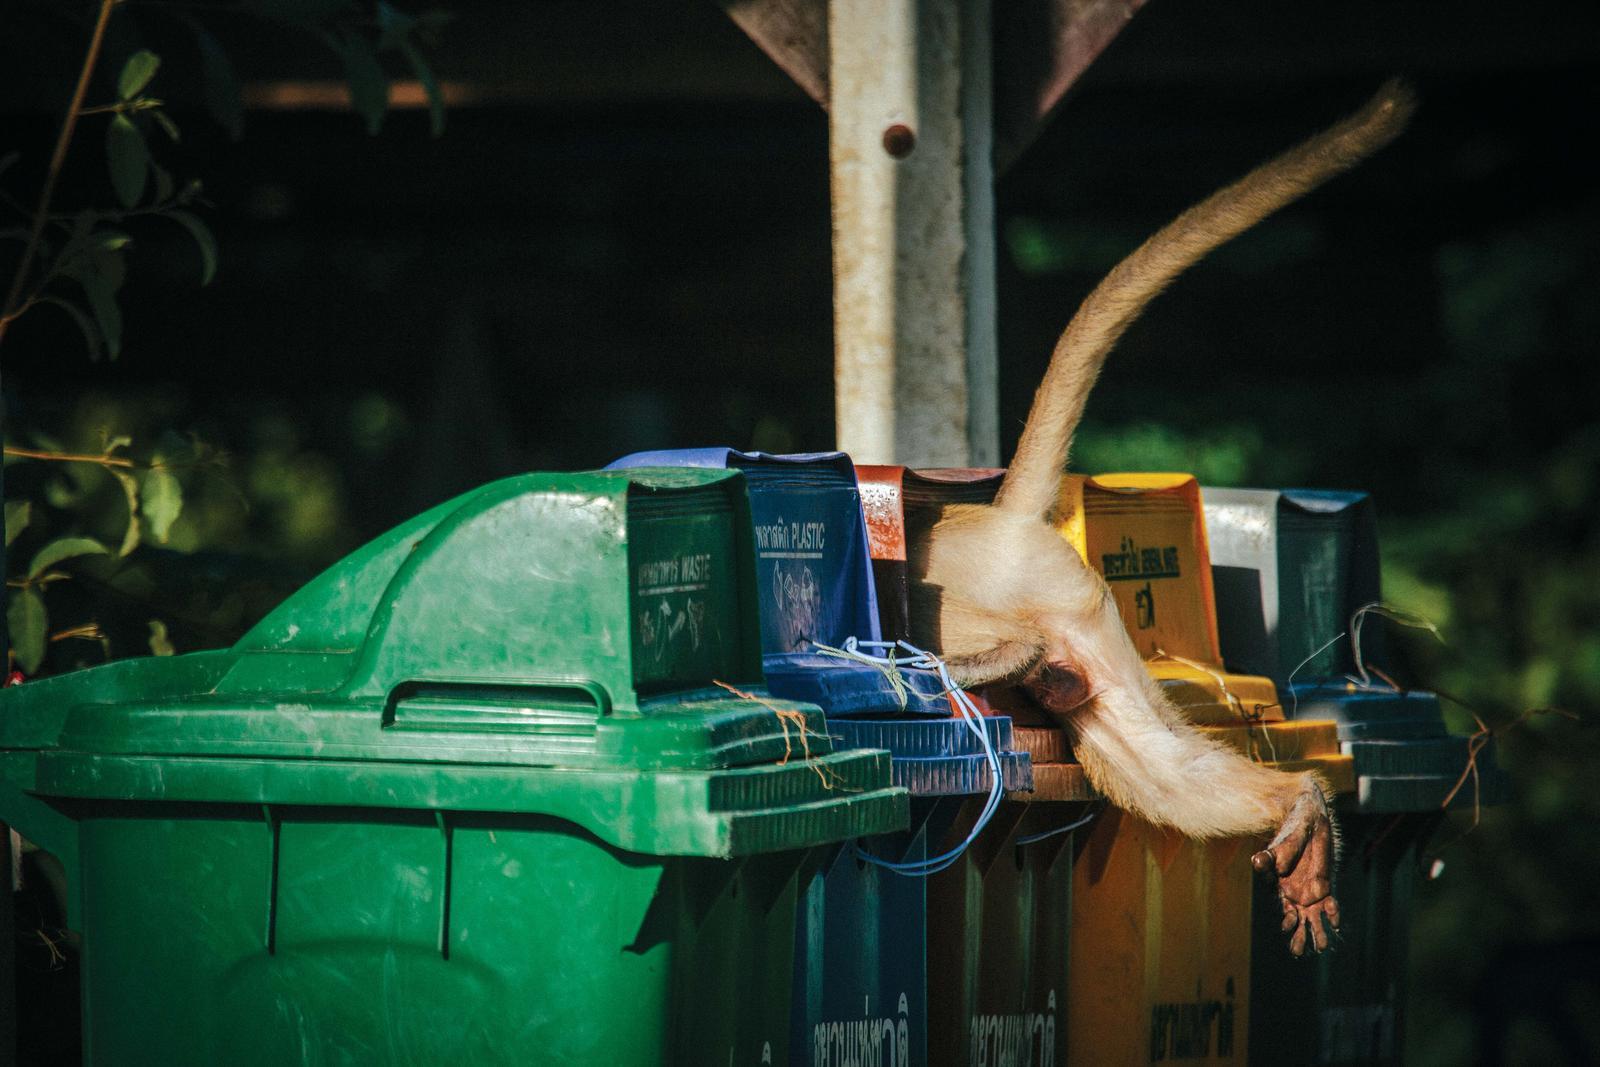 Morgan_heim_macaques_in_trash-3358